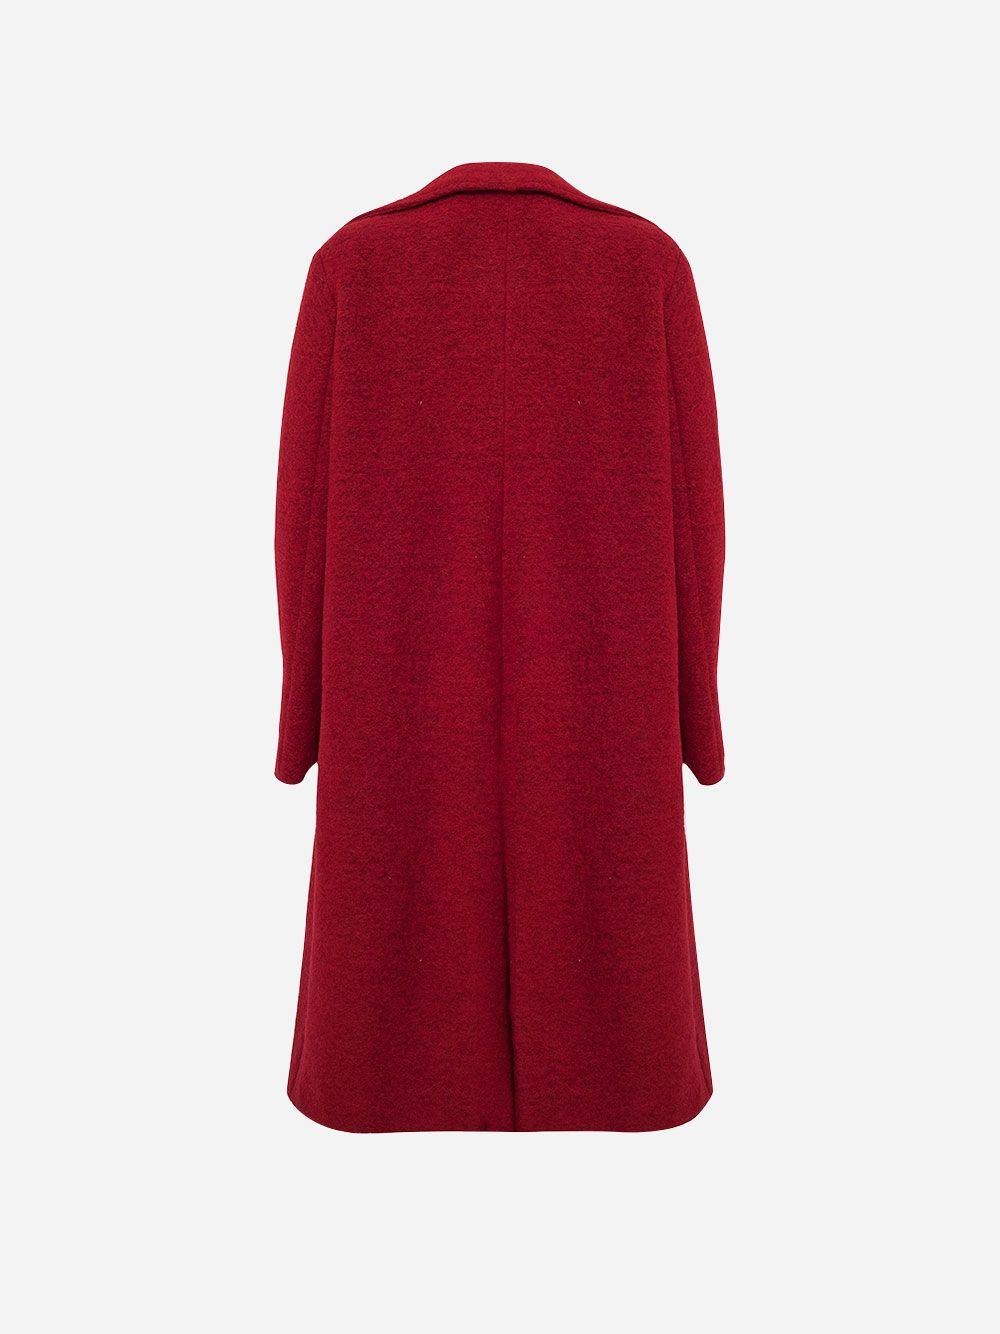 Red Long Coat   Carolina Machado